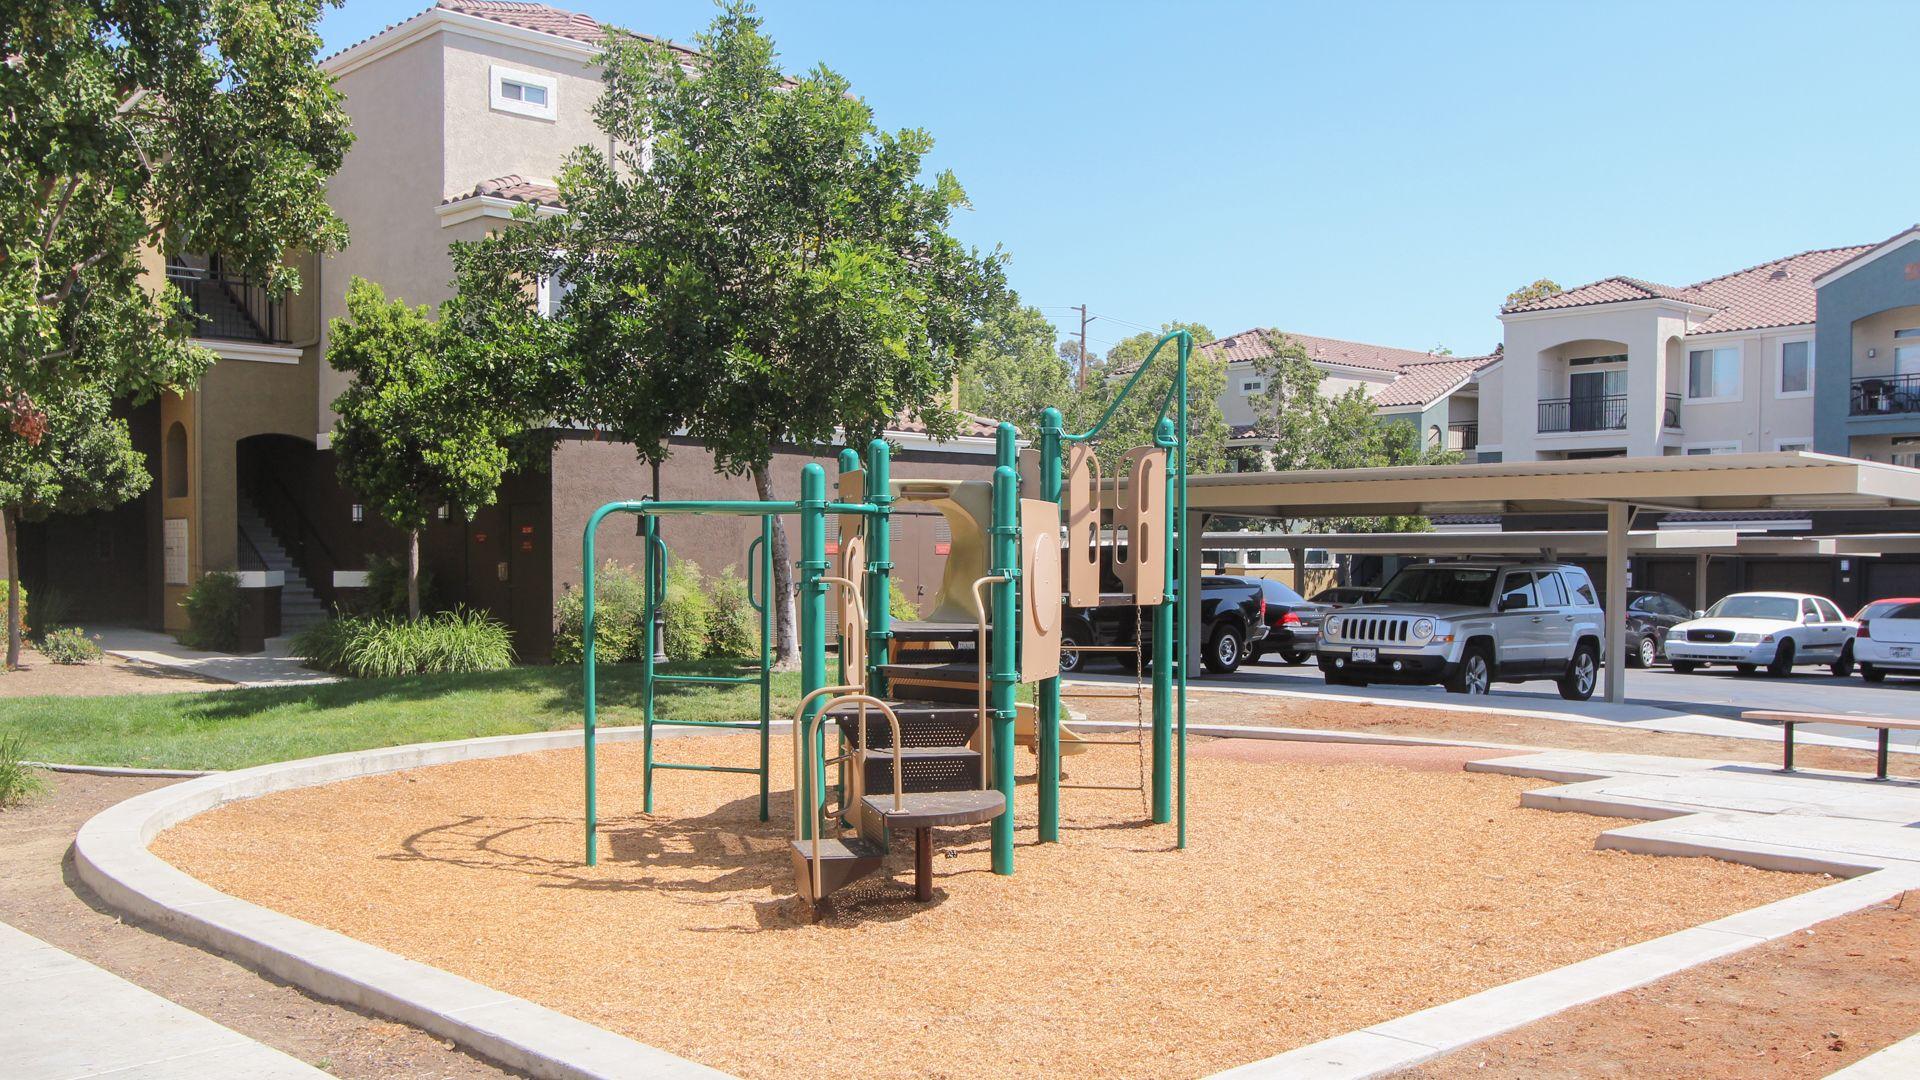 Centre Club Apartments - Playground